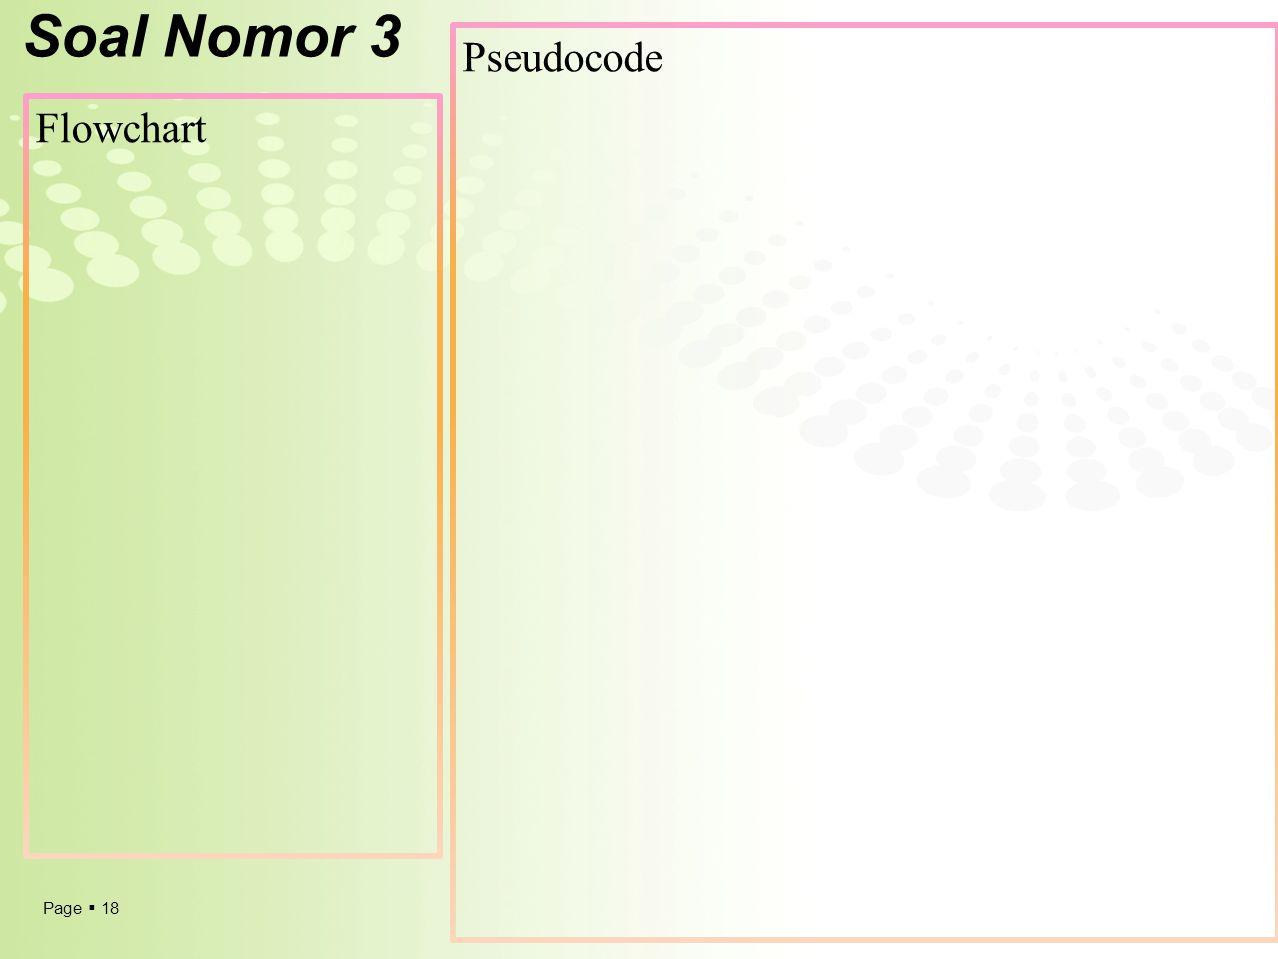 Soal Nomor 3 Pseudocode Flowchart